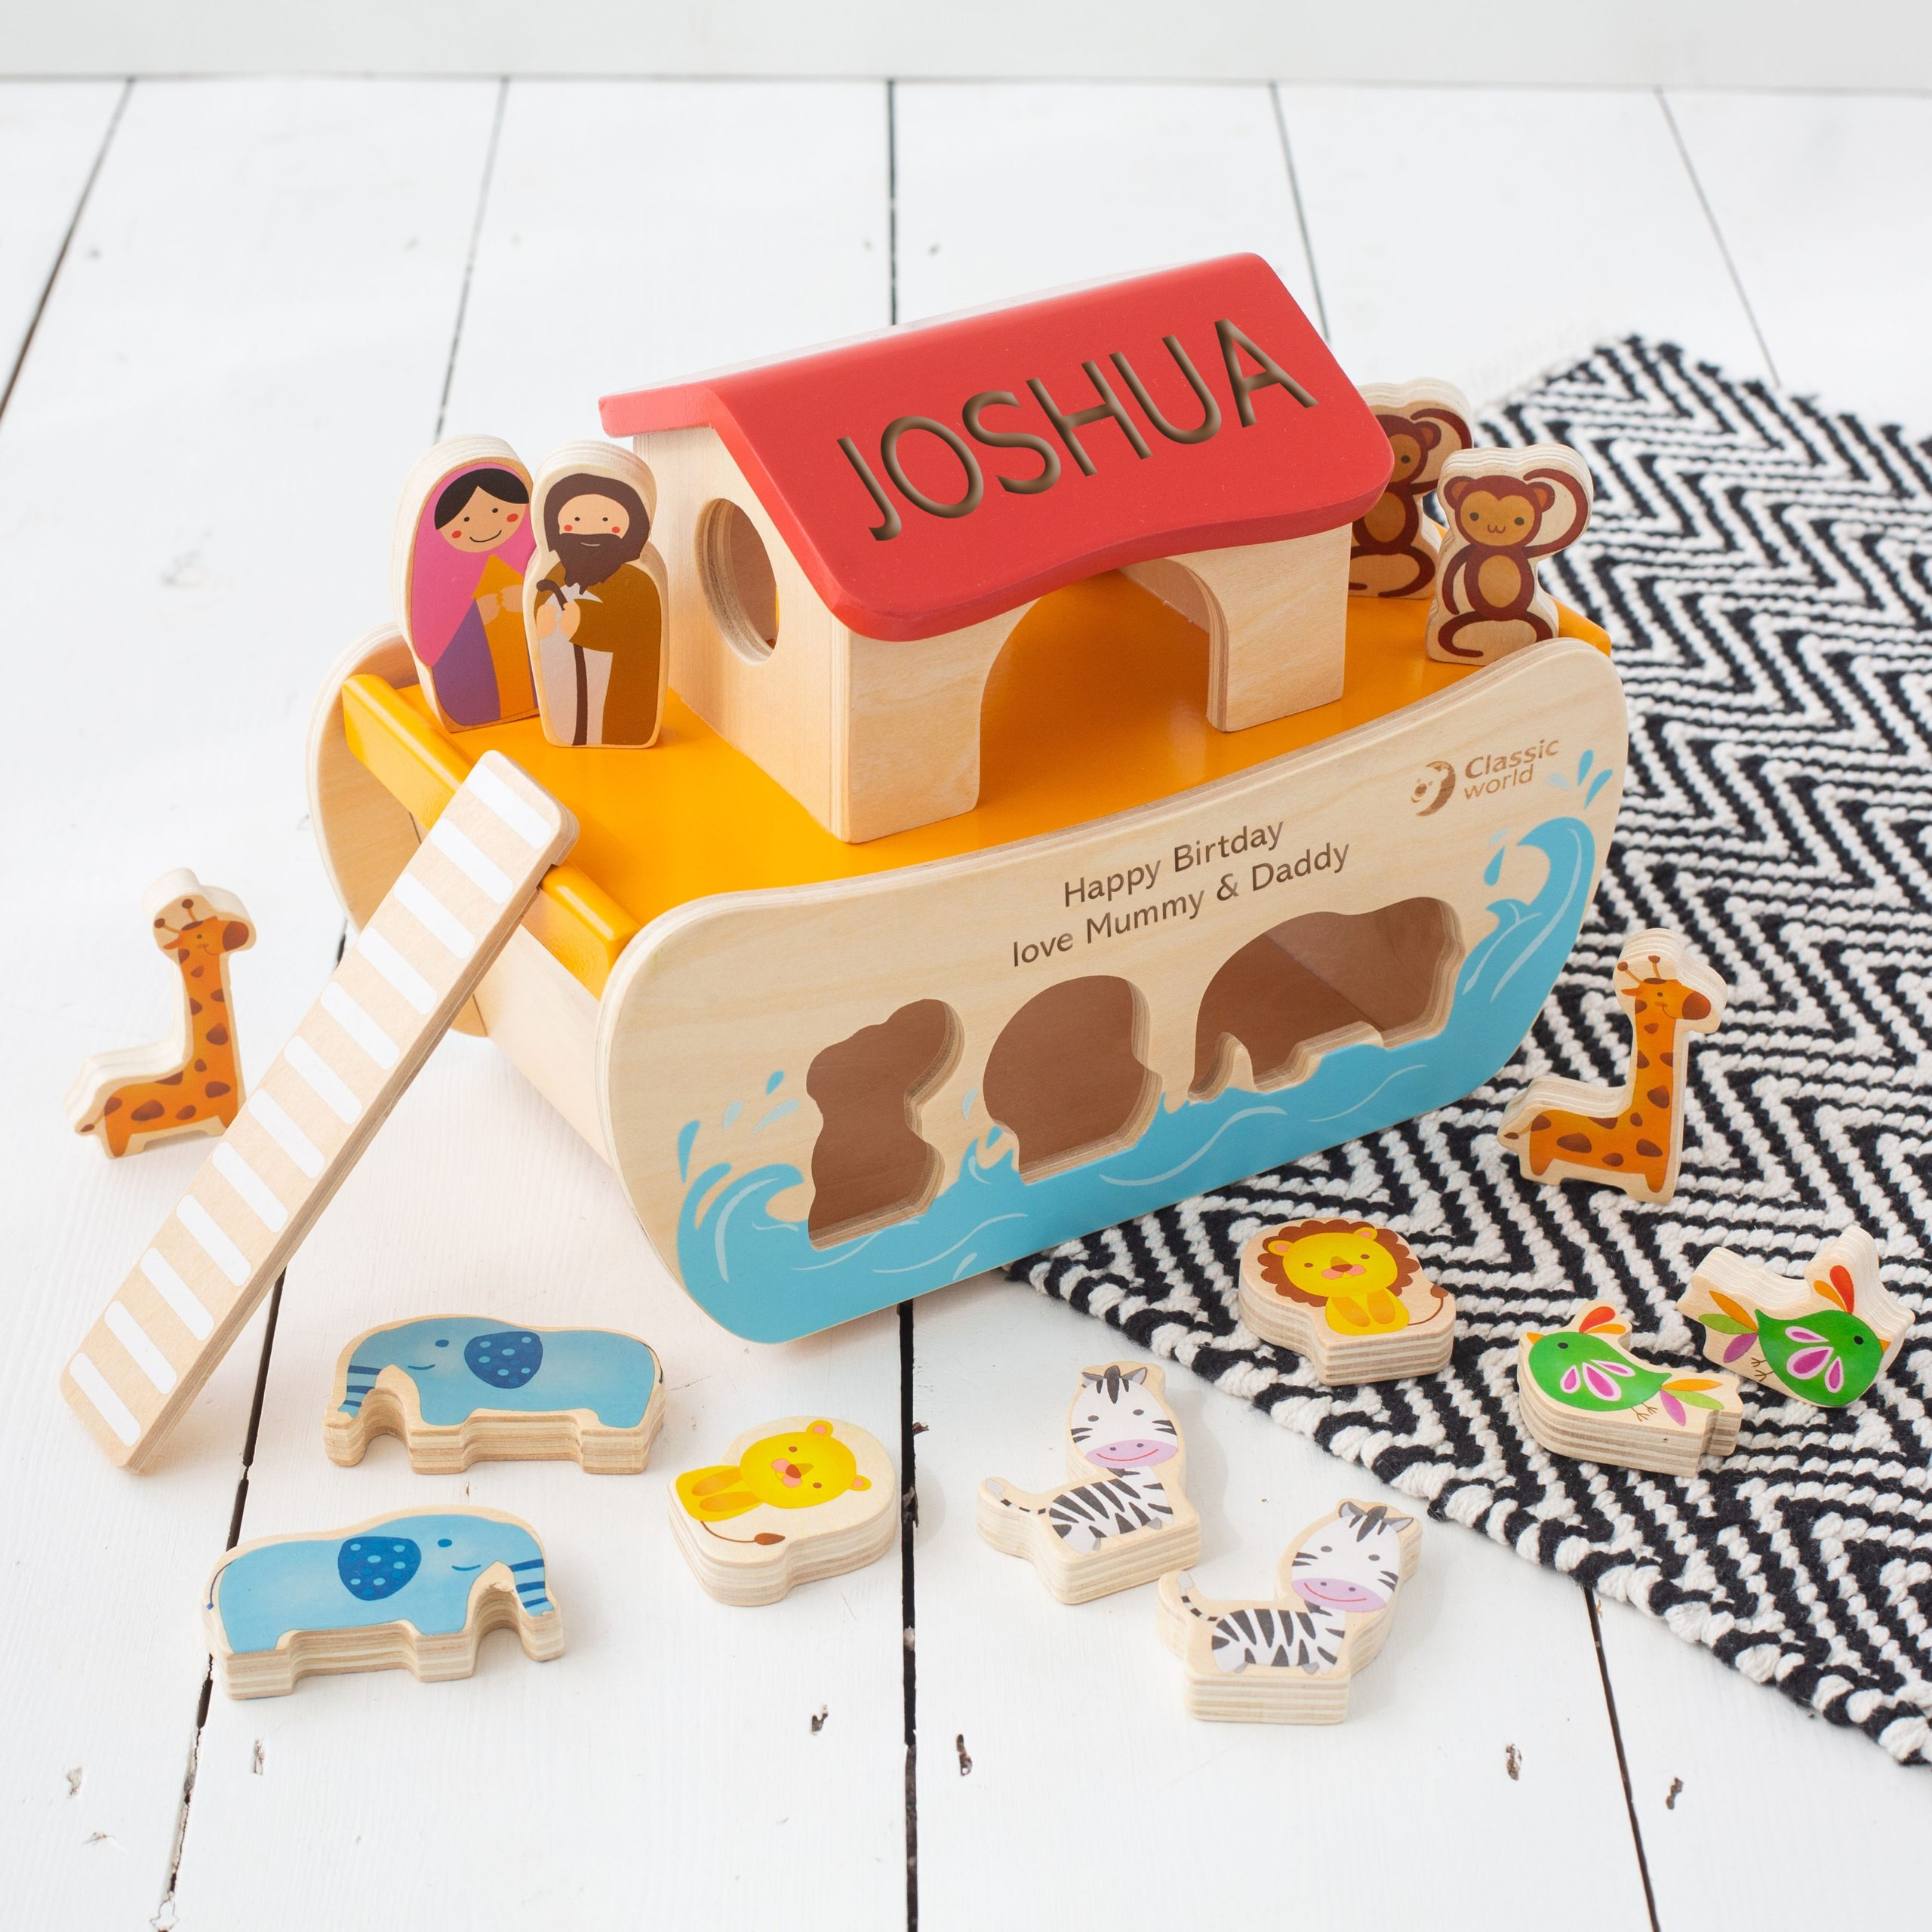 Personalised Noah's Ark Wooden Toy